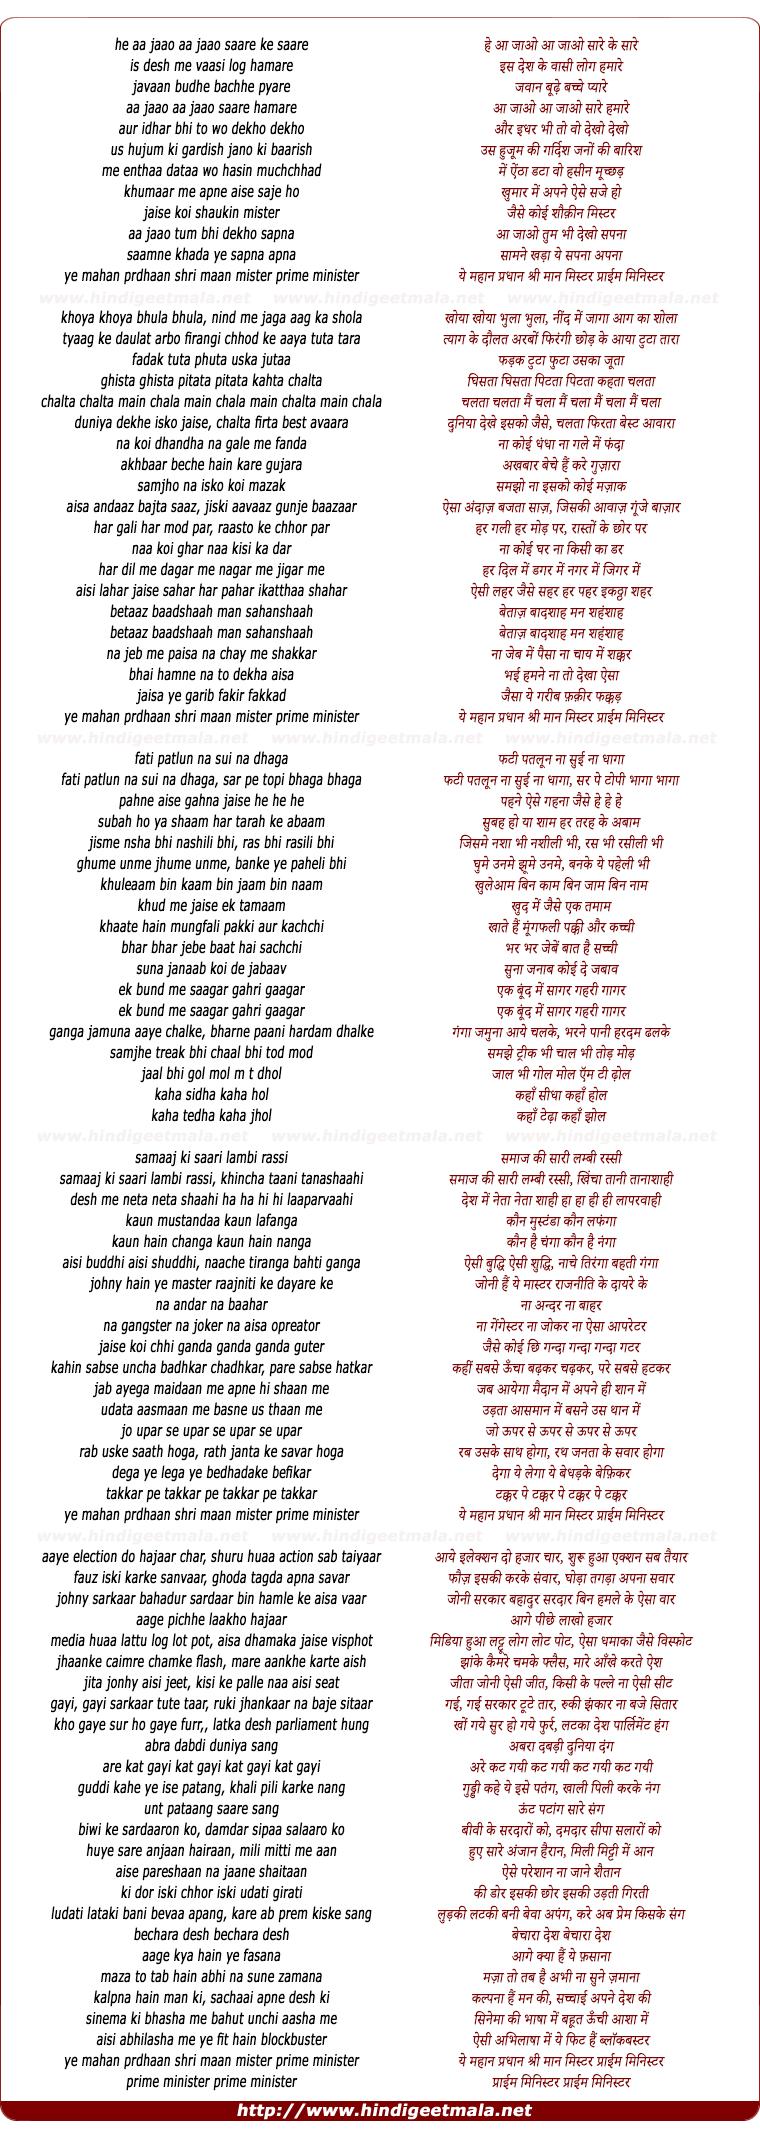 lyrics of song Mr. Prime Minister (Hindi)